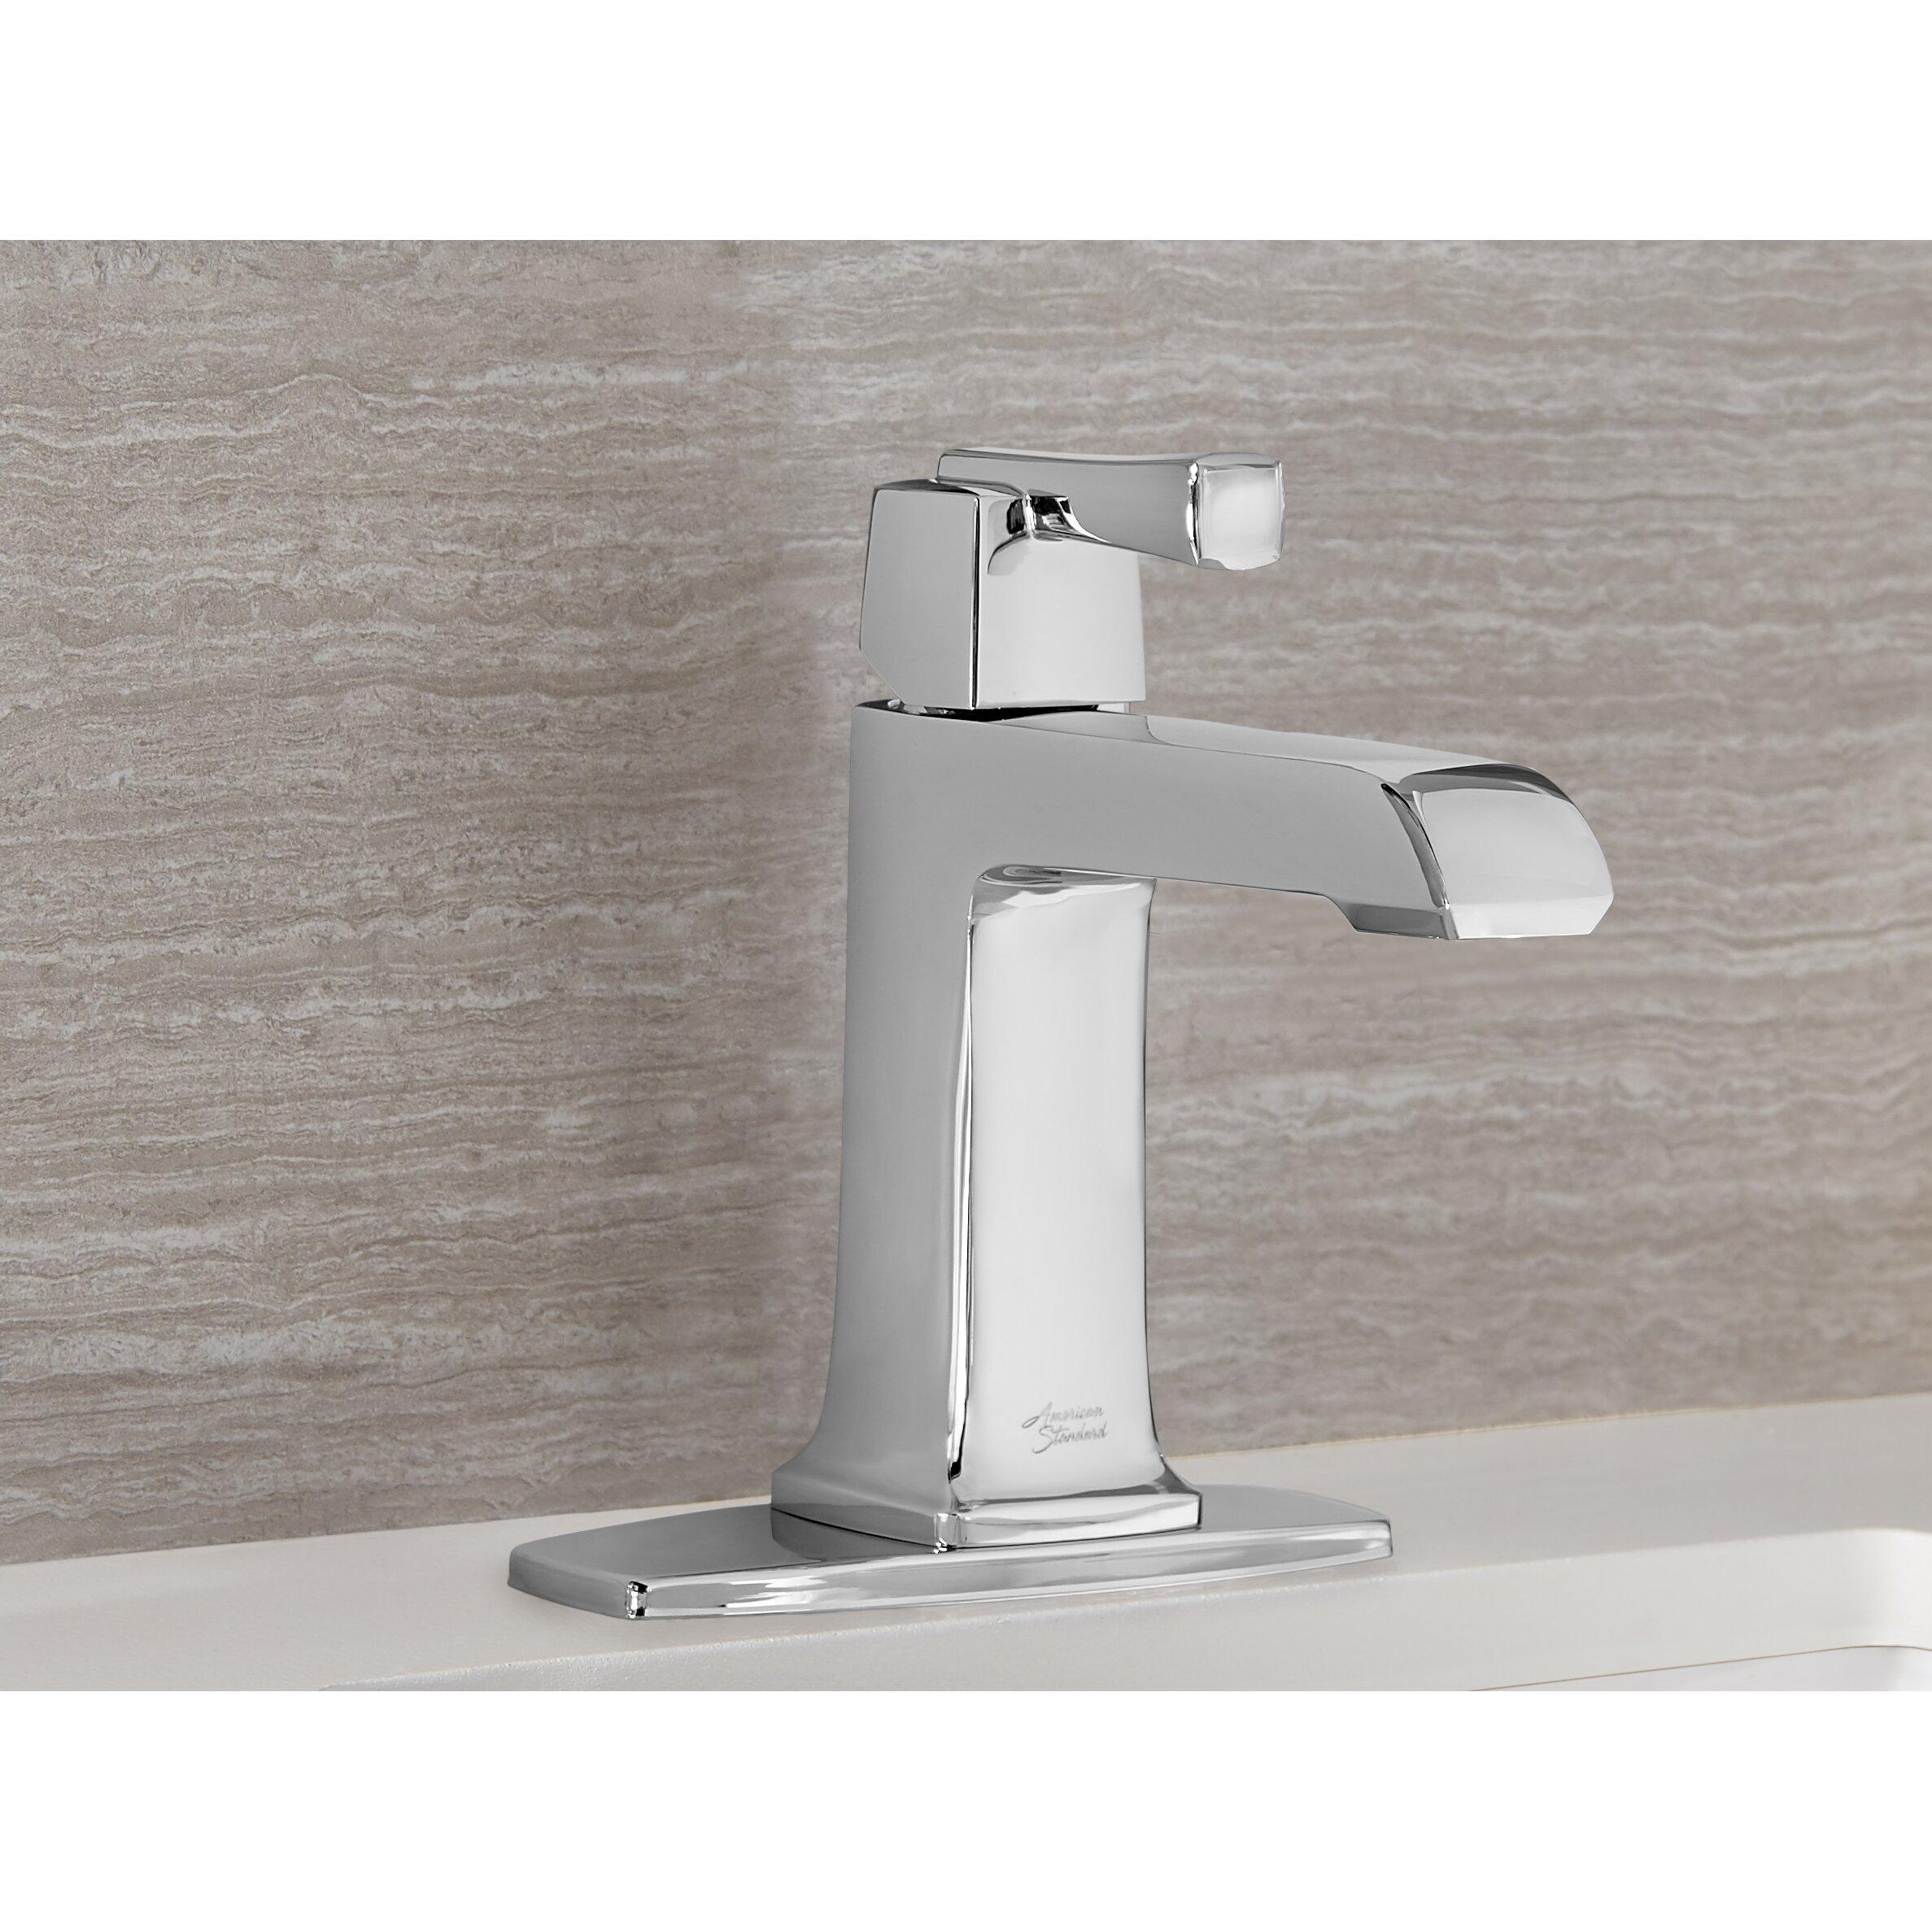 Elegant American Standard Bathroom Faucet Bathroom Interior Design